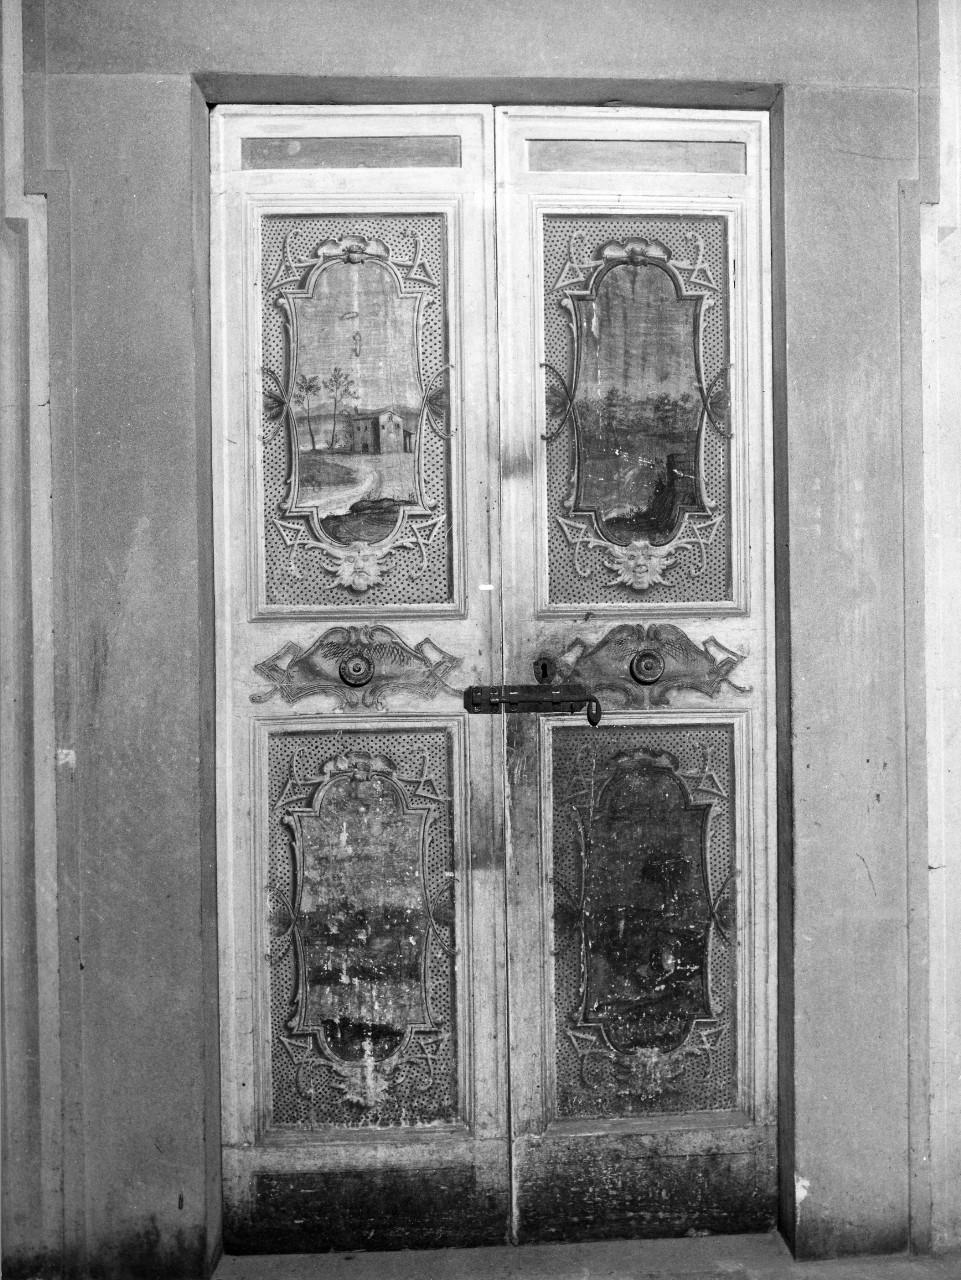 paesaggio (porta - a due battenti) - bottega toscana (sec. XVIII)